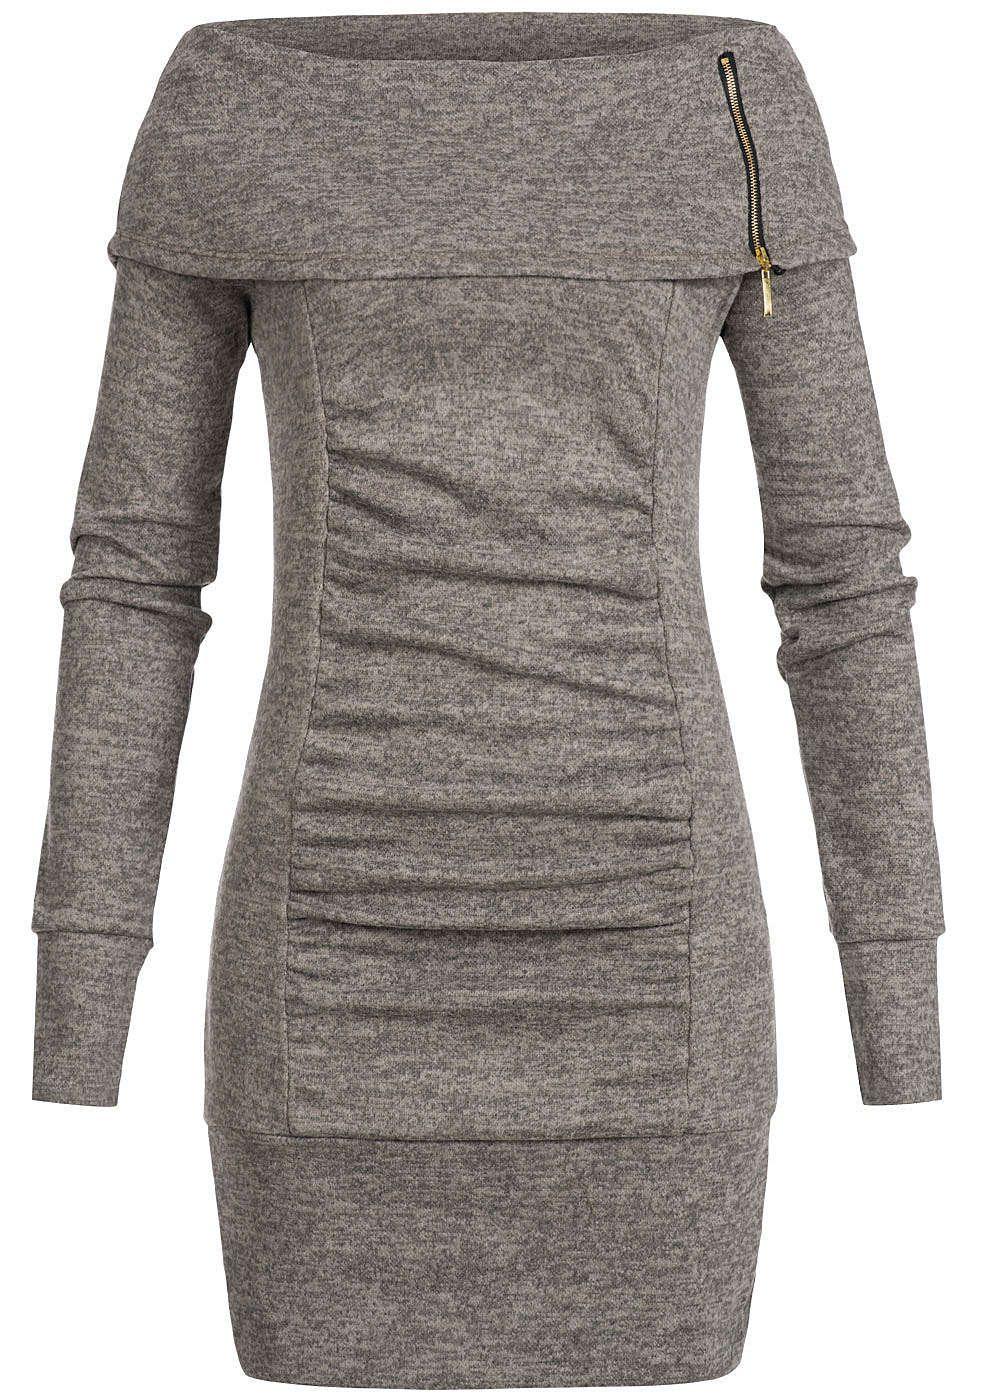 69d90236d775c9 Styleboom Fashion Damen Longform Sweater Zipper weiter Rollkragen fango  braun melange - 77onlineshop